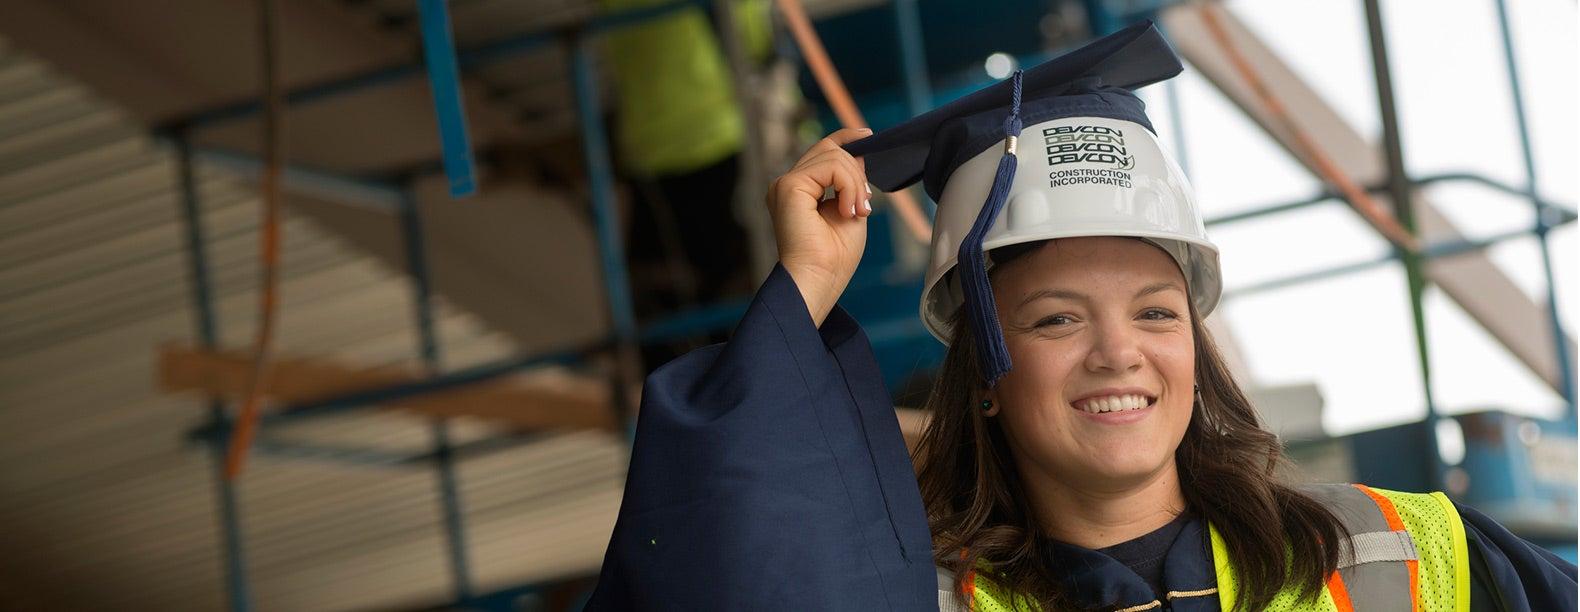 From Grad Cap to Hard Hat | UC Davis